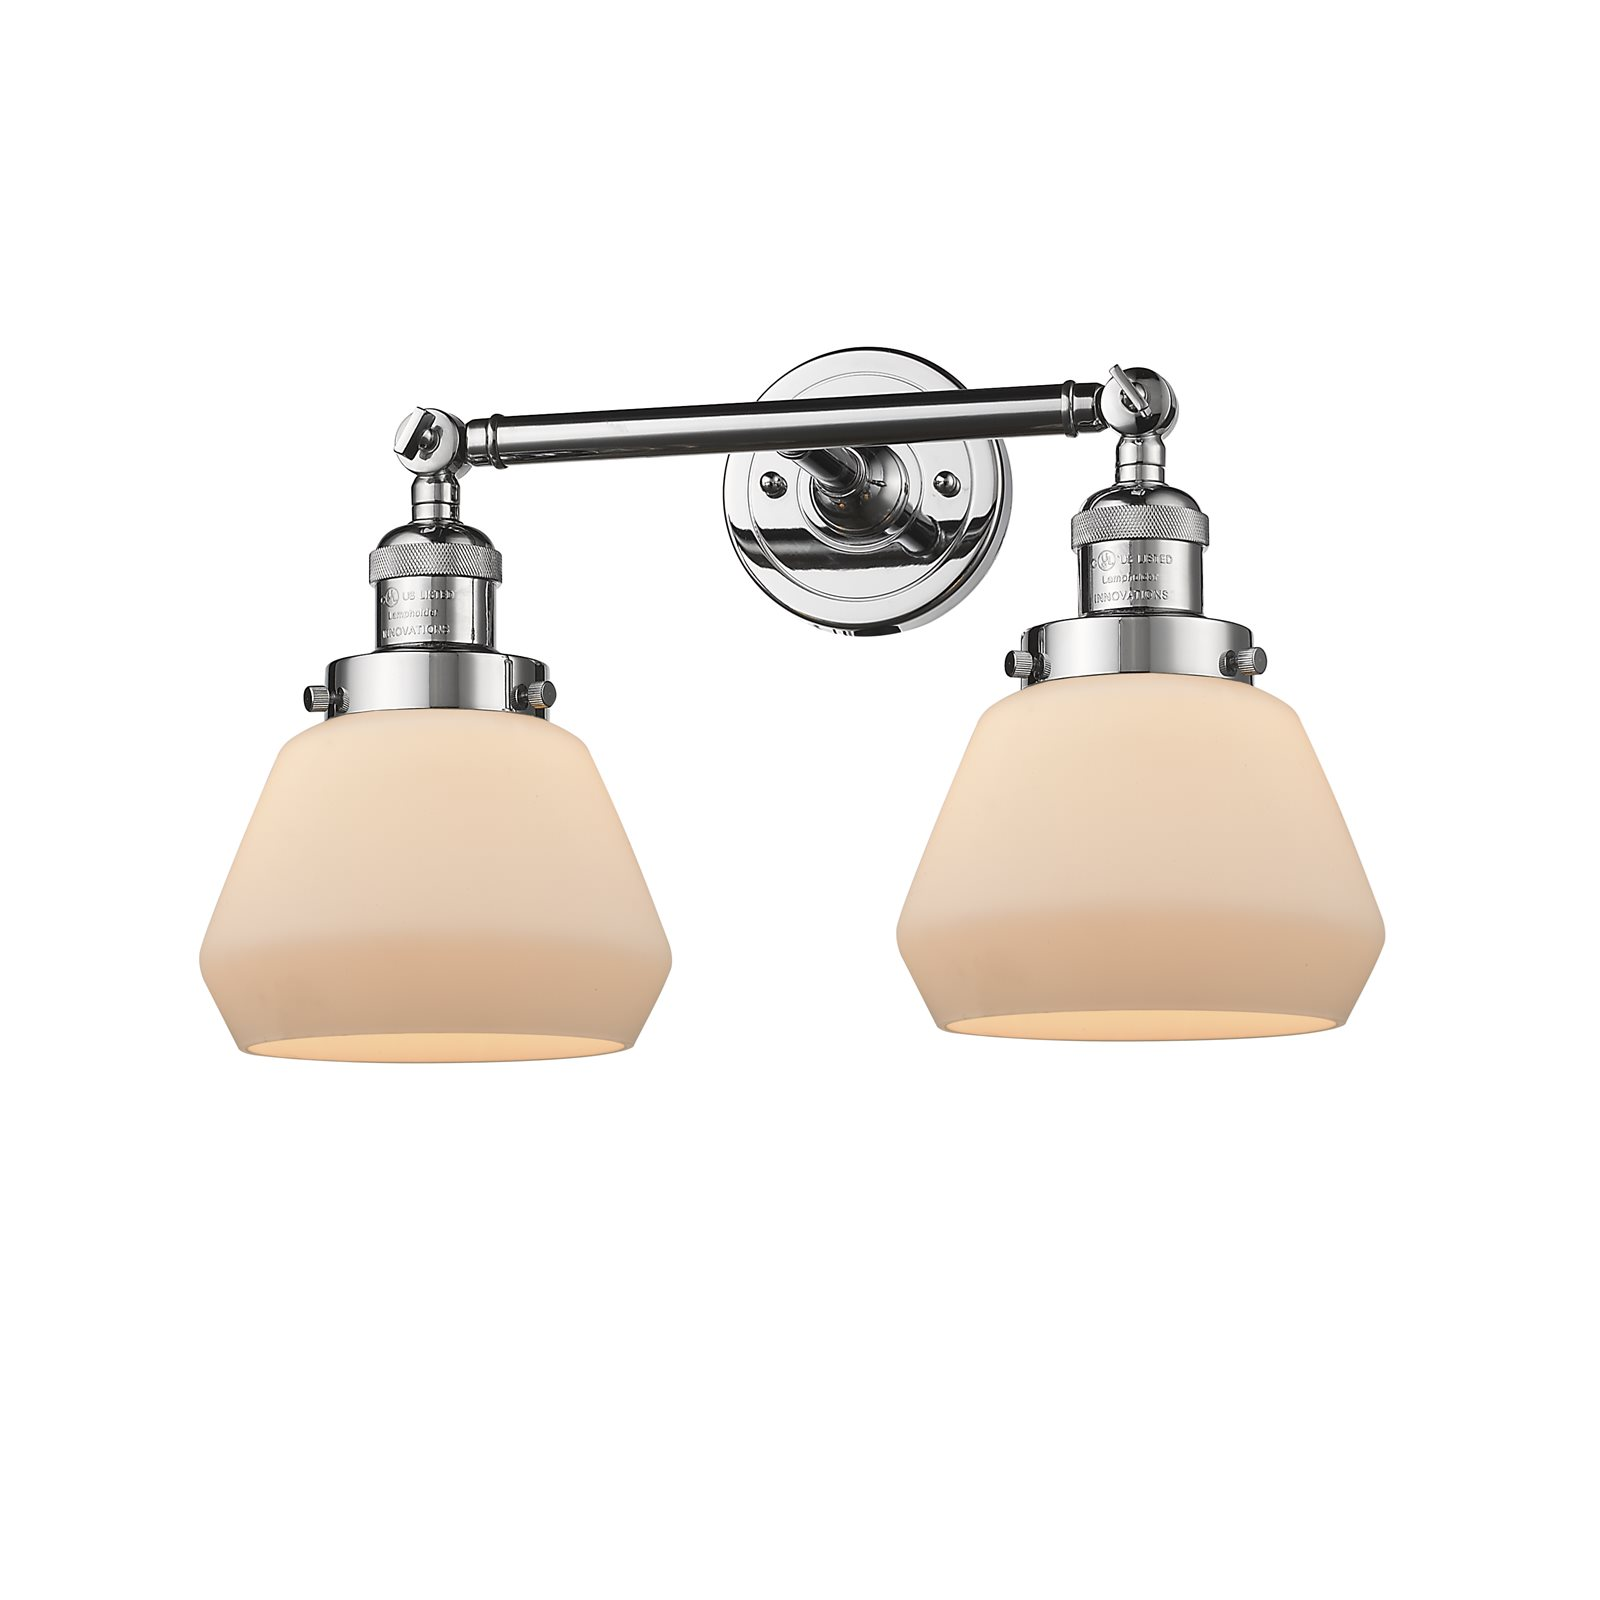 "Innovations 2-LT LED Fulton 16.5"" Bathroom Fixture Polished Chrome 208-PC-G171-LED by"